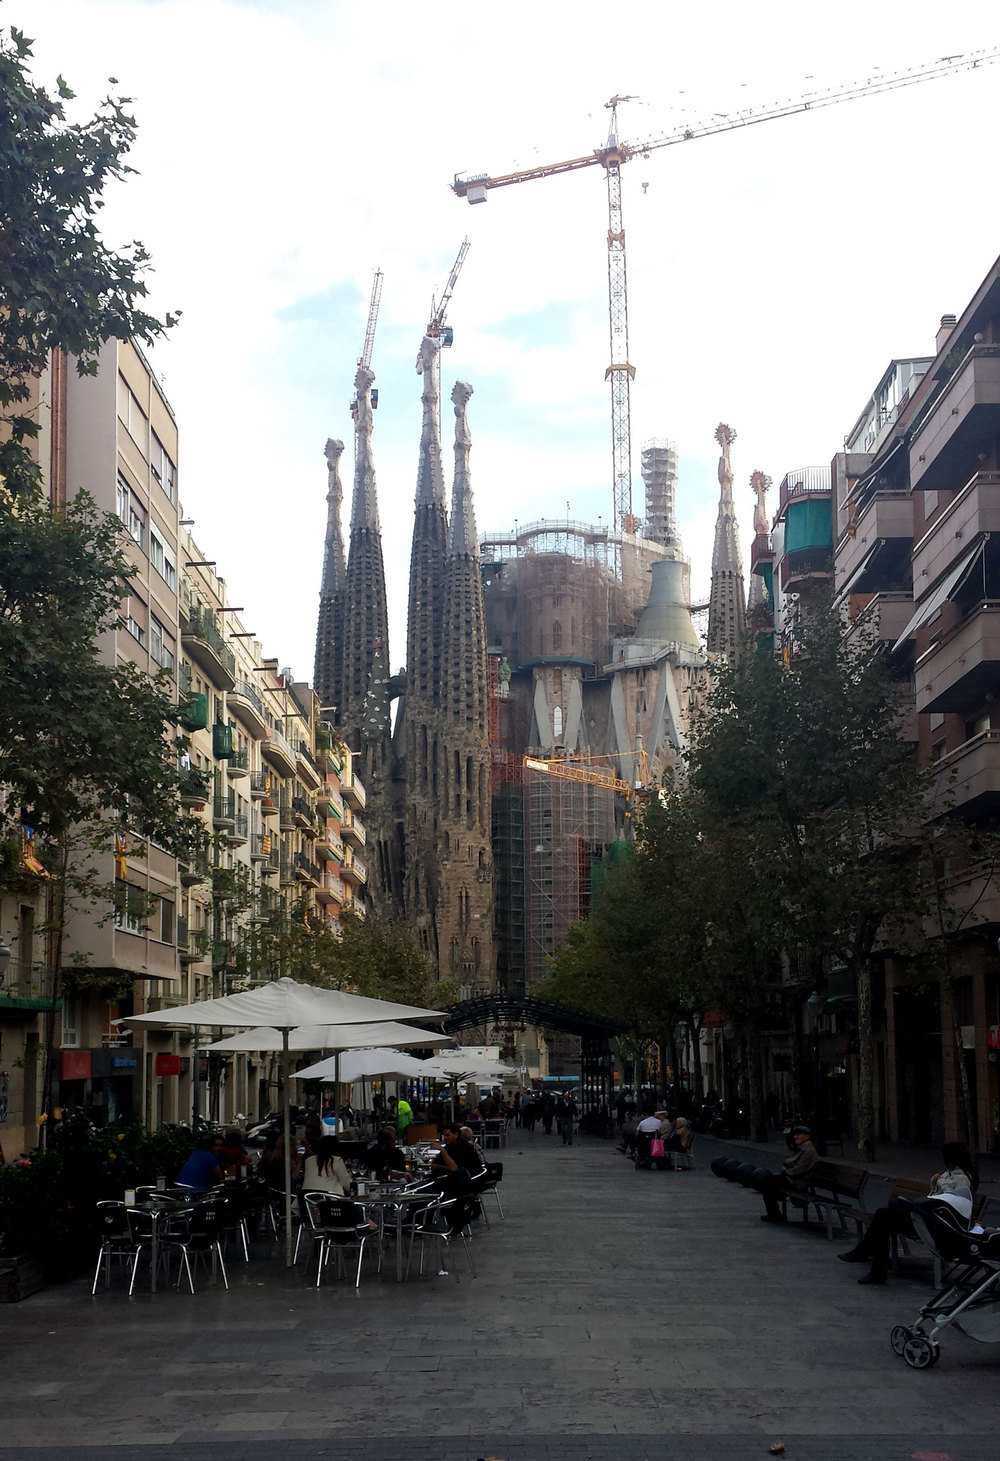 From Gaudi Avenue